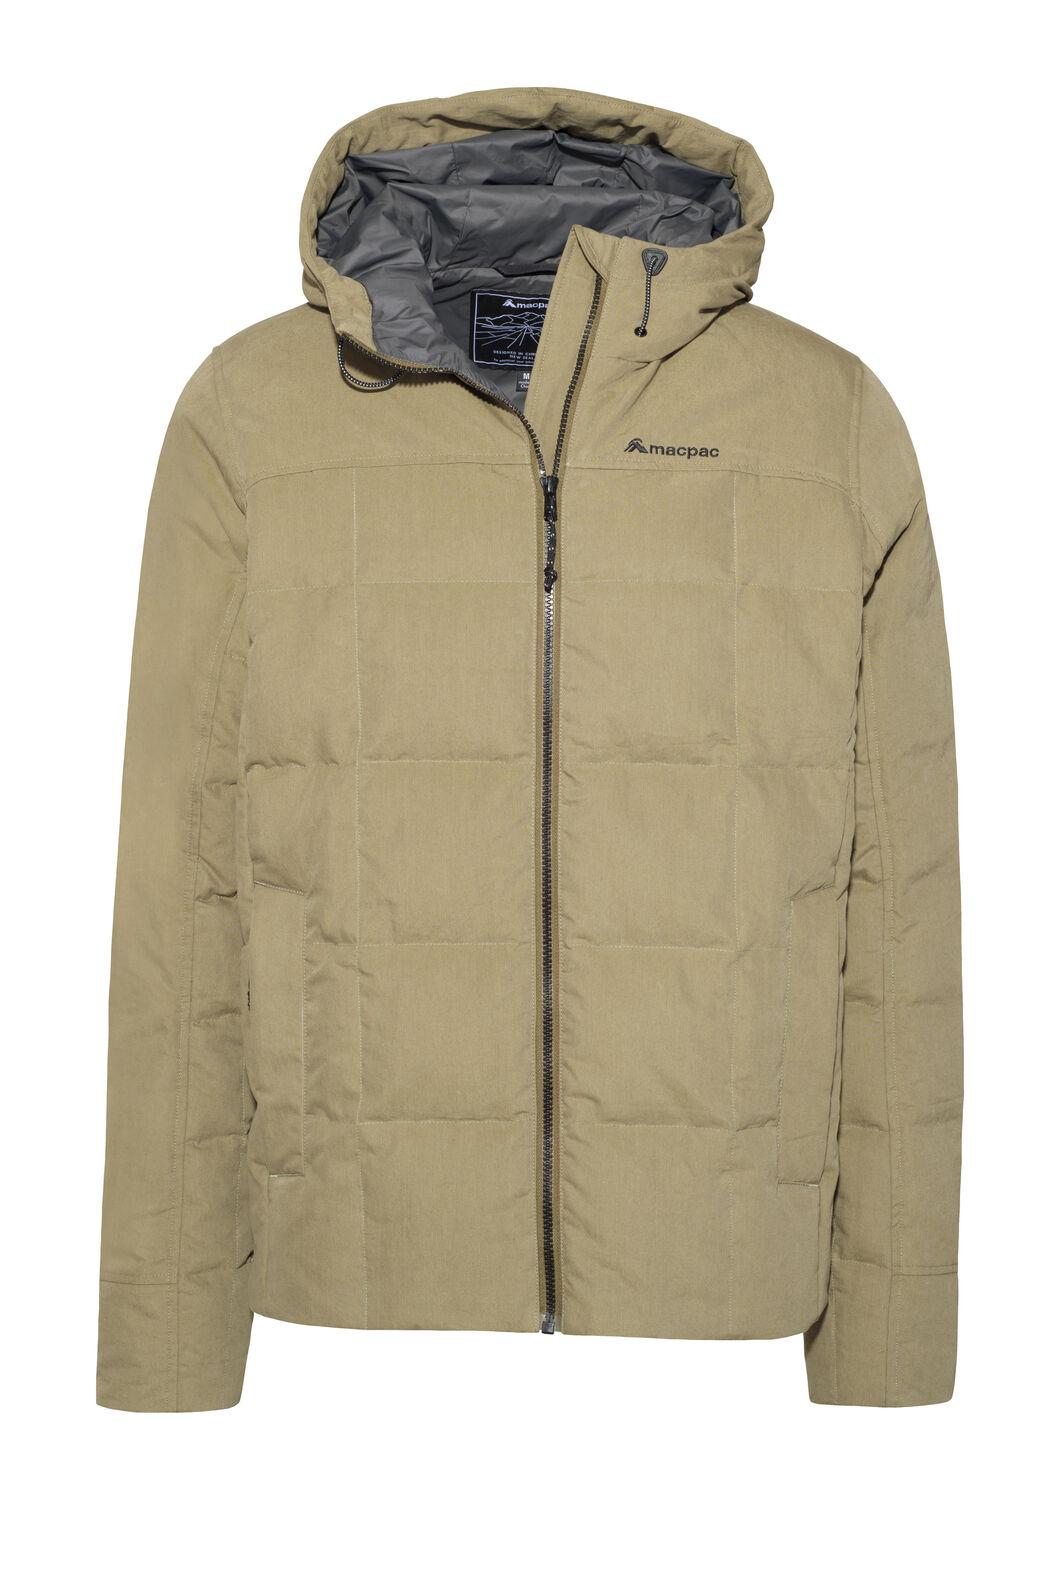 Macpac Fusion Down Jacket — Men's, Military Olive, hi-res